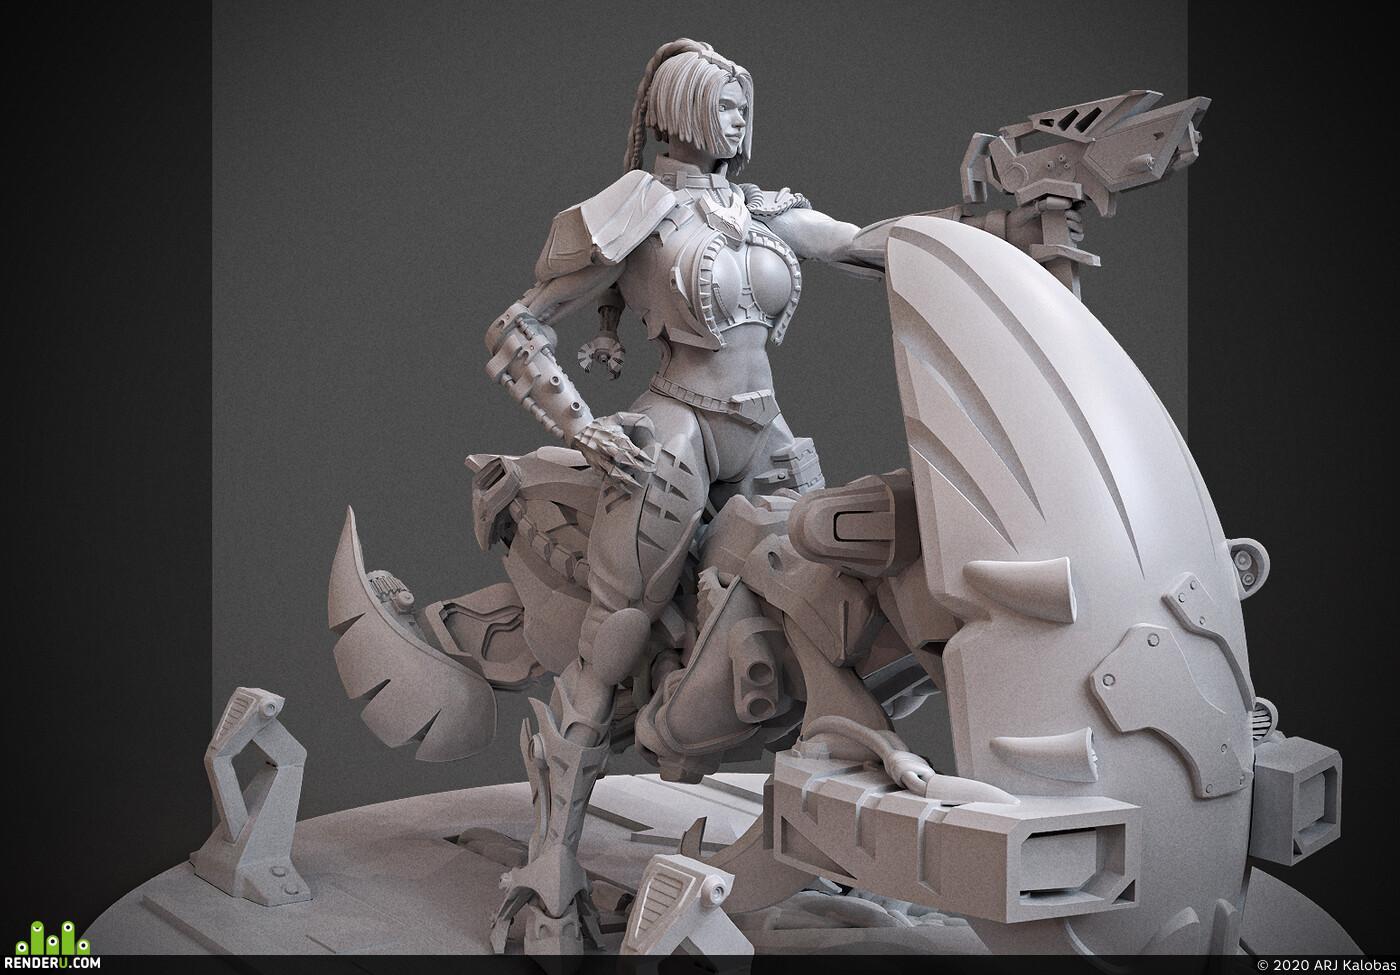 Digital 3D, 3D Printing, Science Fiction, Mecha, Character Modeling, cyberpunk, miniature, Cybersplit, arjkalobas